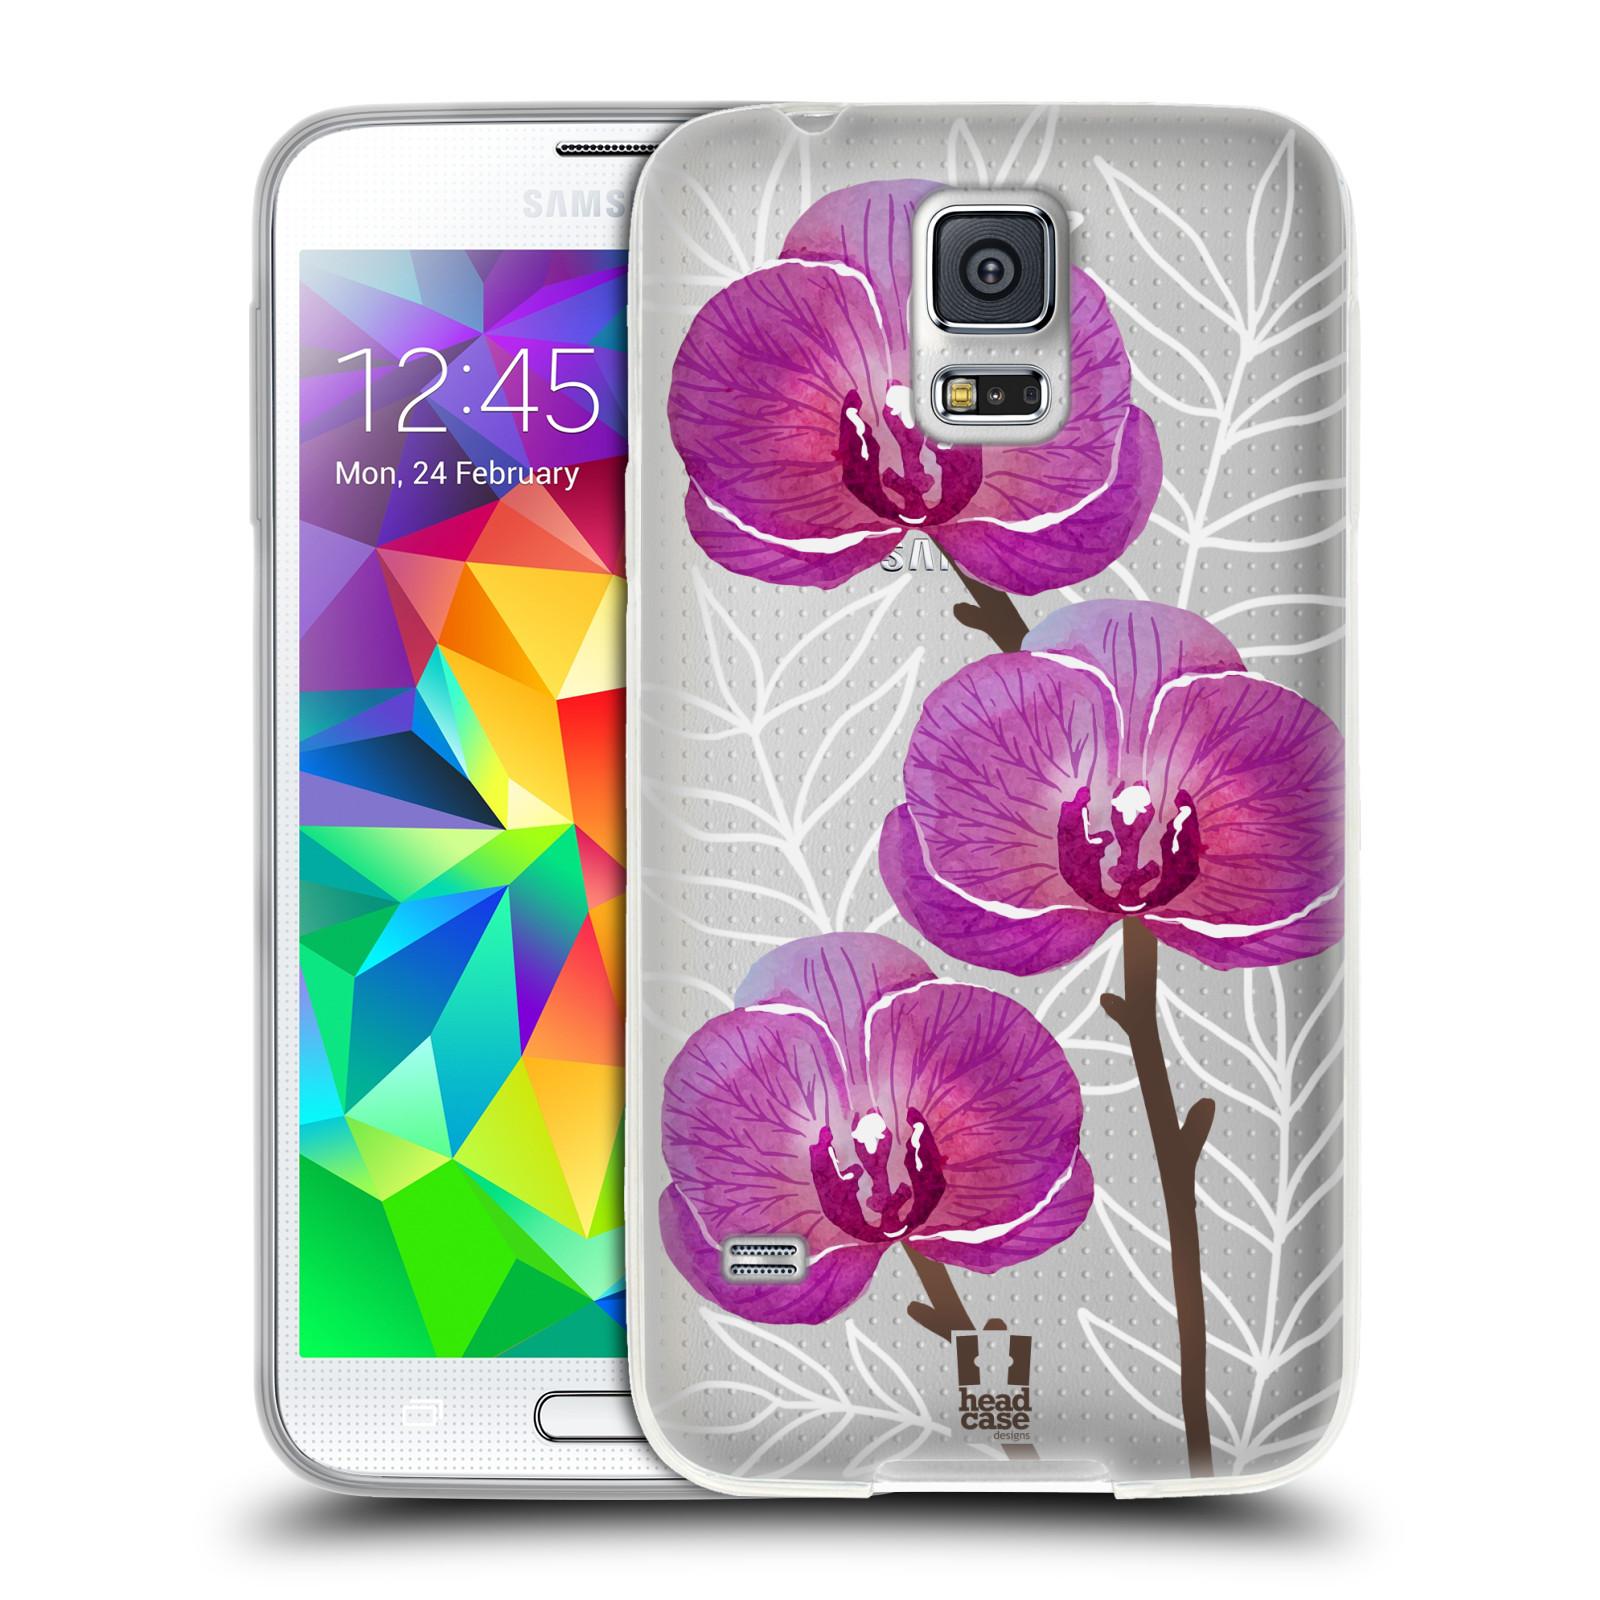 Silikonové pouzdro na mobil Samsung Galaxy S5 Neo - Head Case - Hezoučké kvítky - průhledné